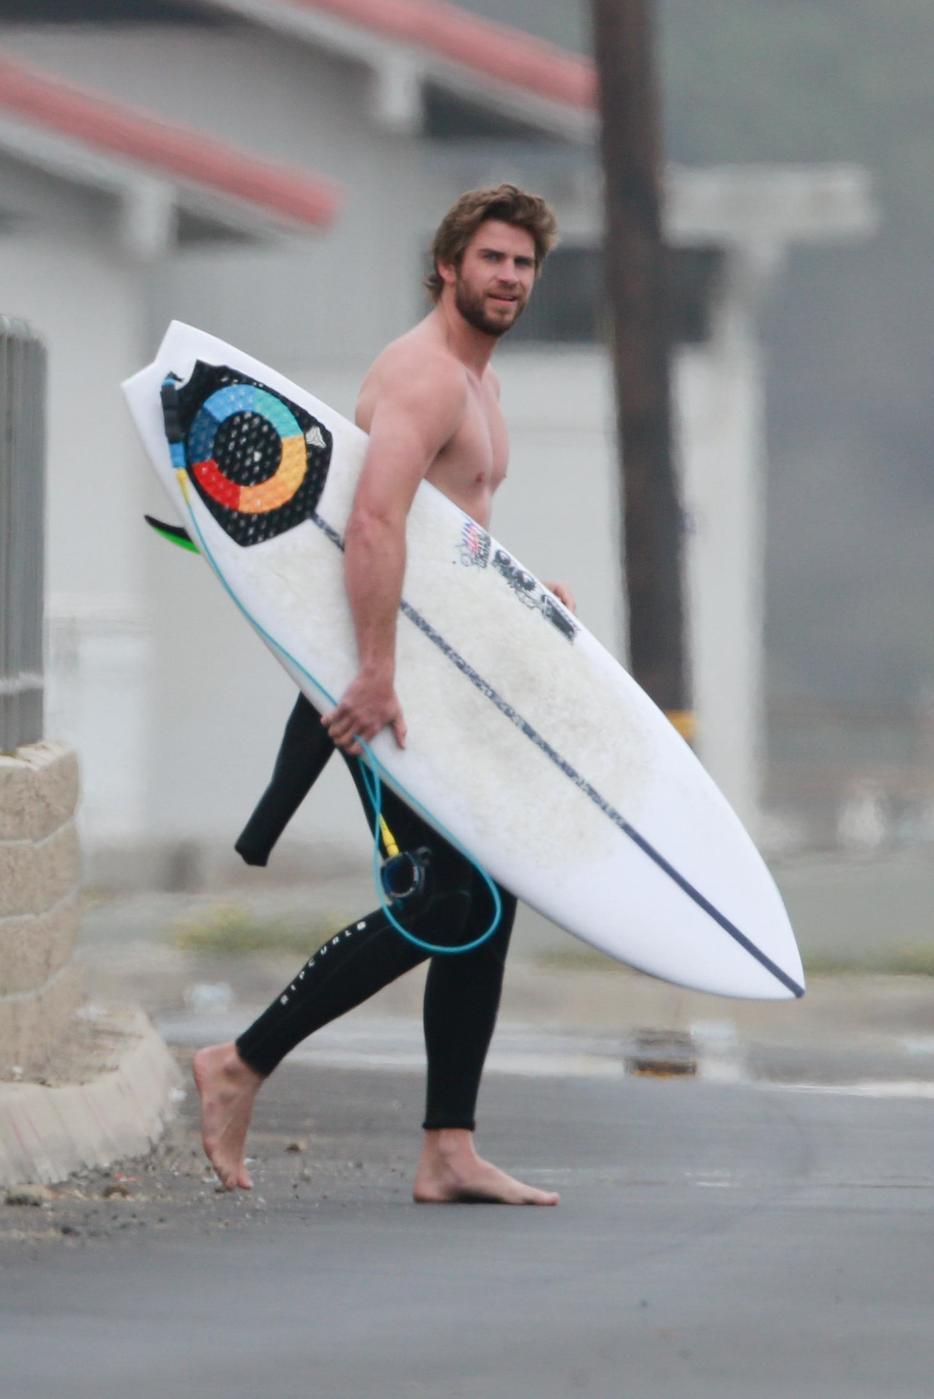 6 Insanely Hot Pics Of Liam Hemsworth Surfing In Malibu